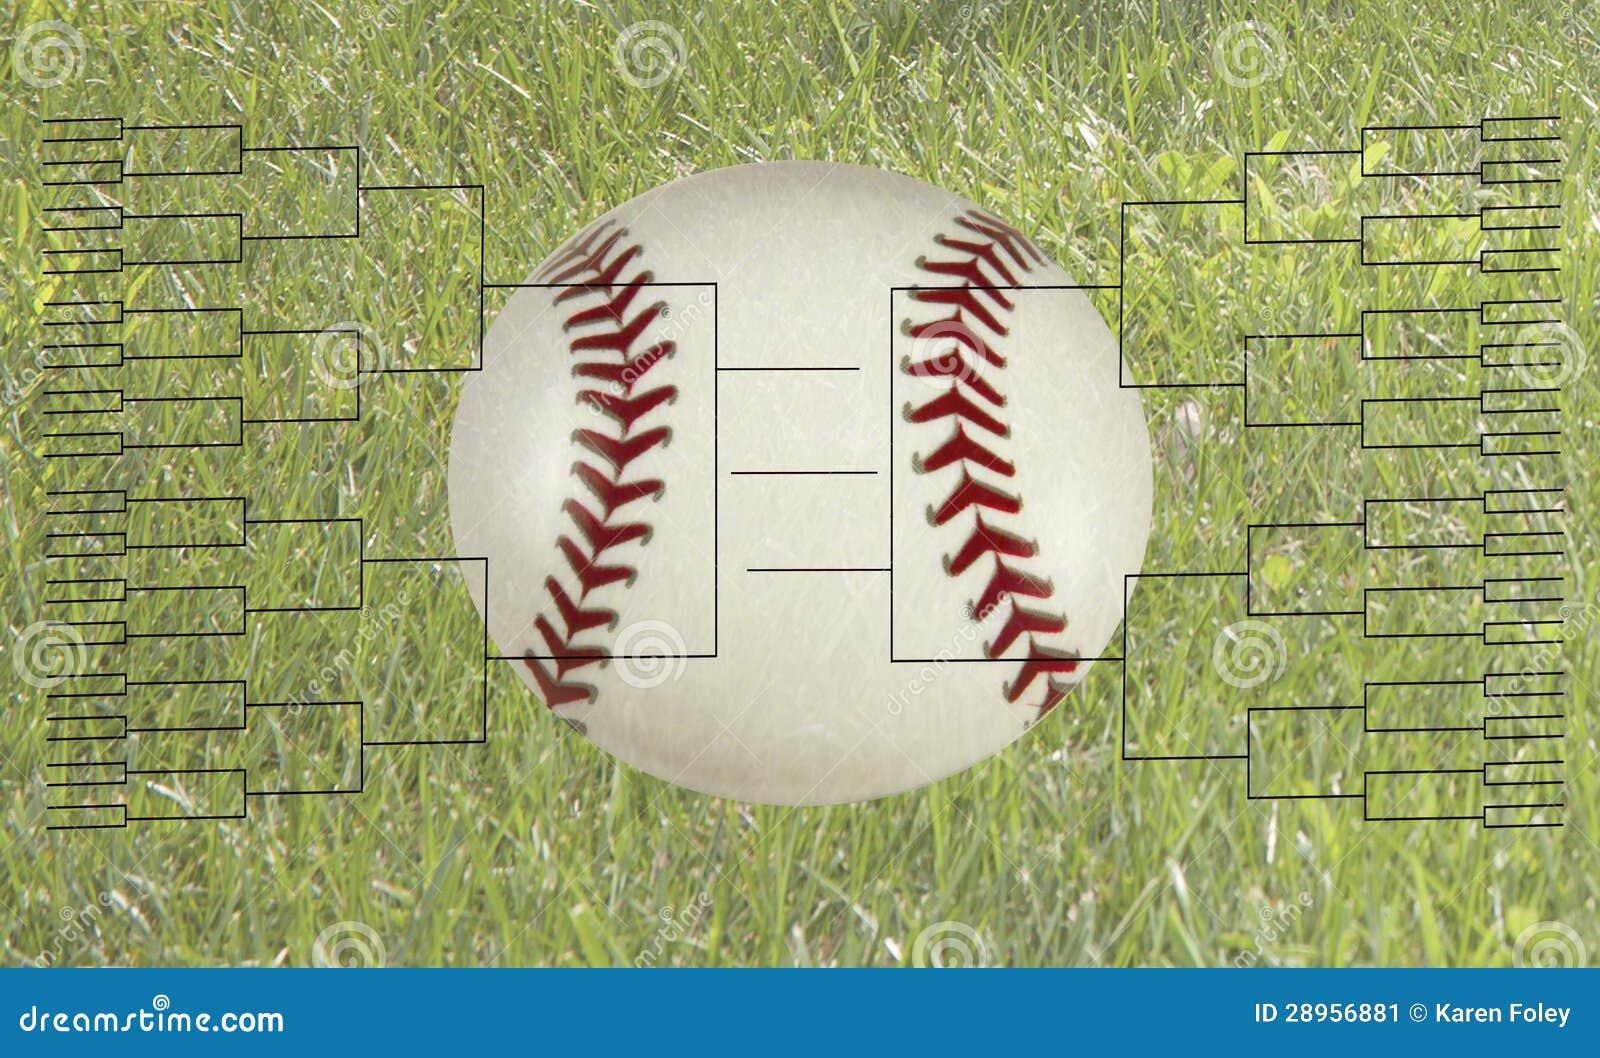 softball tour nt template stock photos images pictures 64 team baseball tour nt bracket stock image